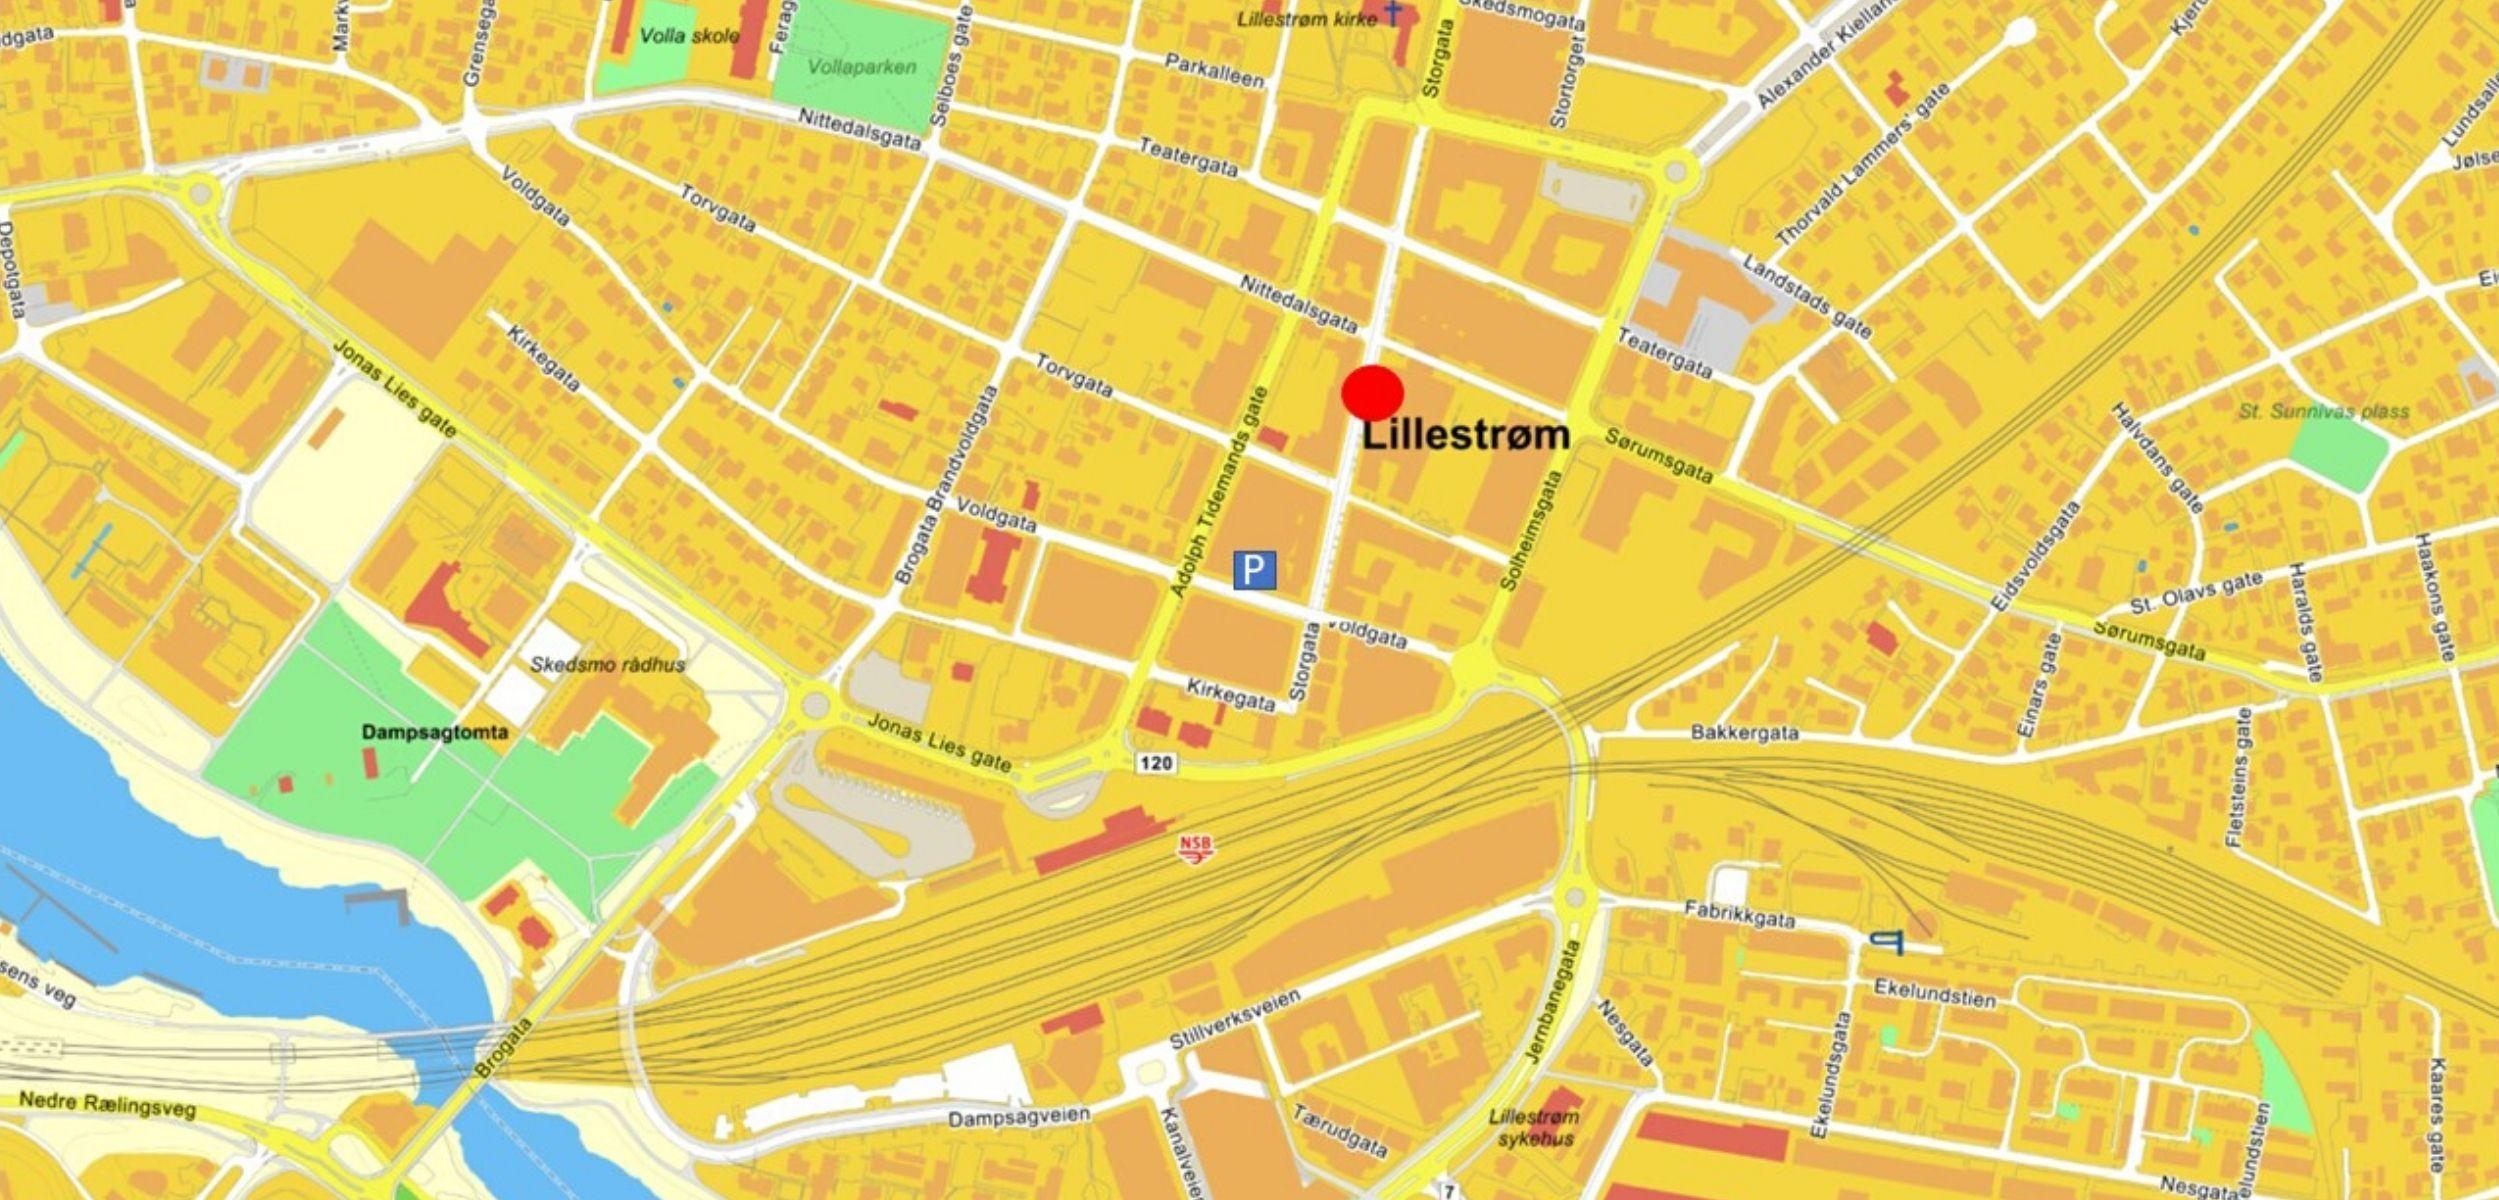 MetaResource, Ethos academy, Lillestrøm